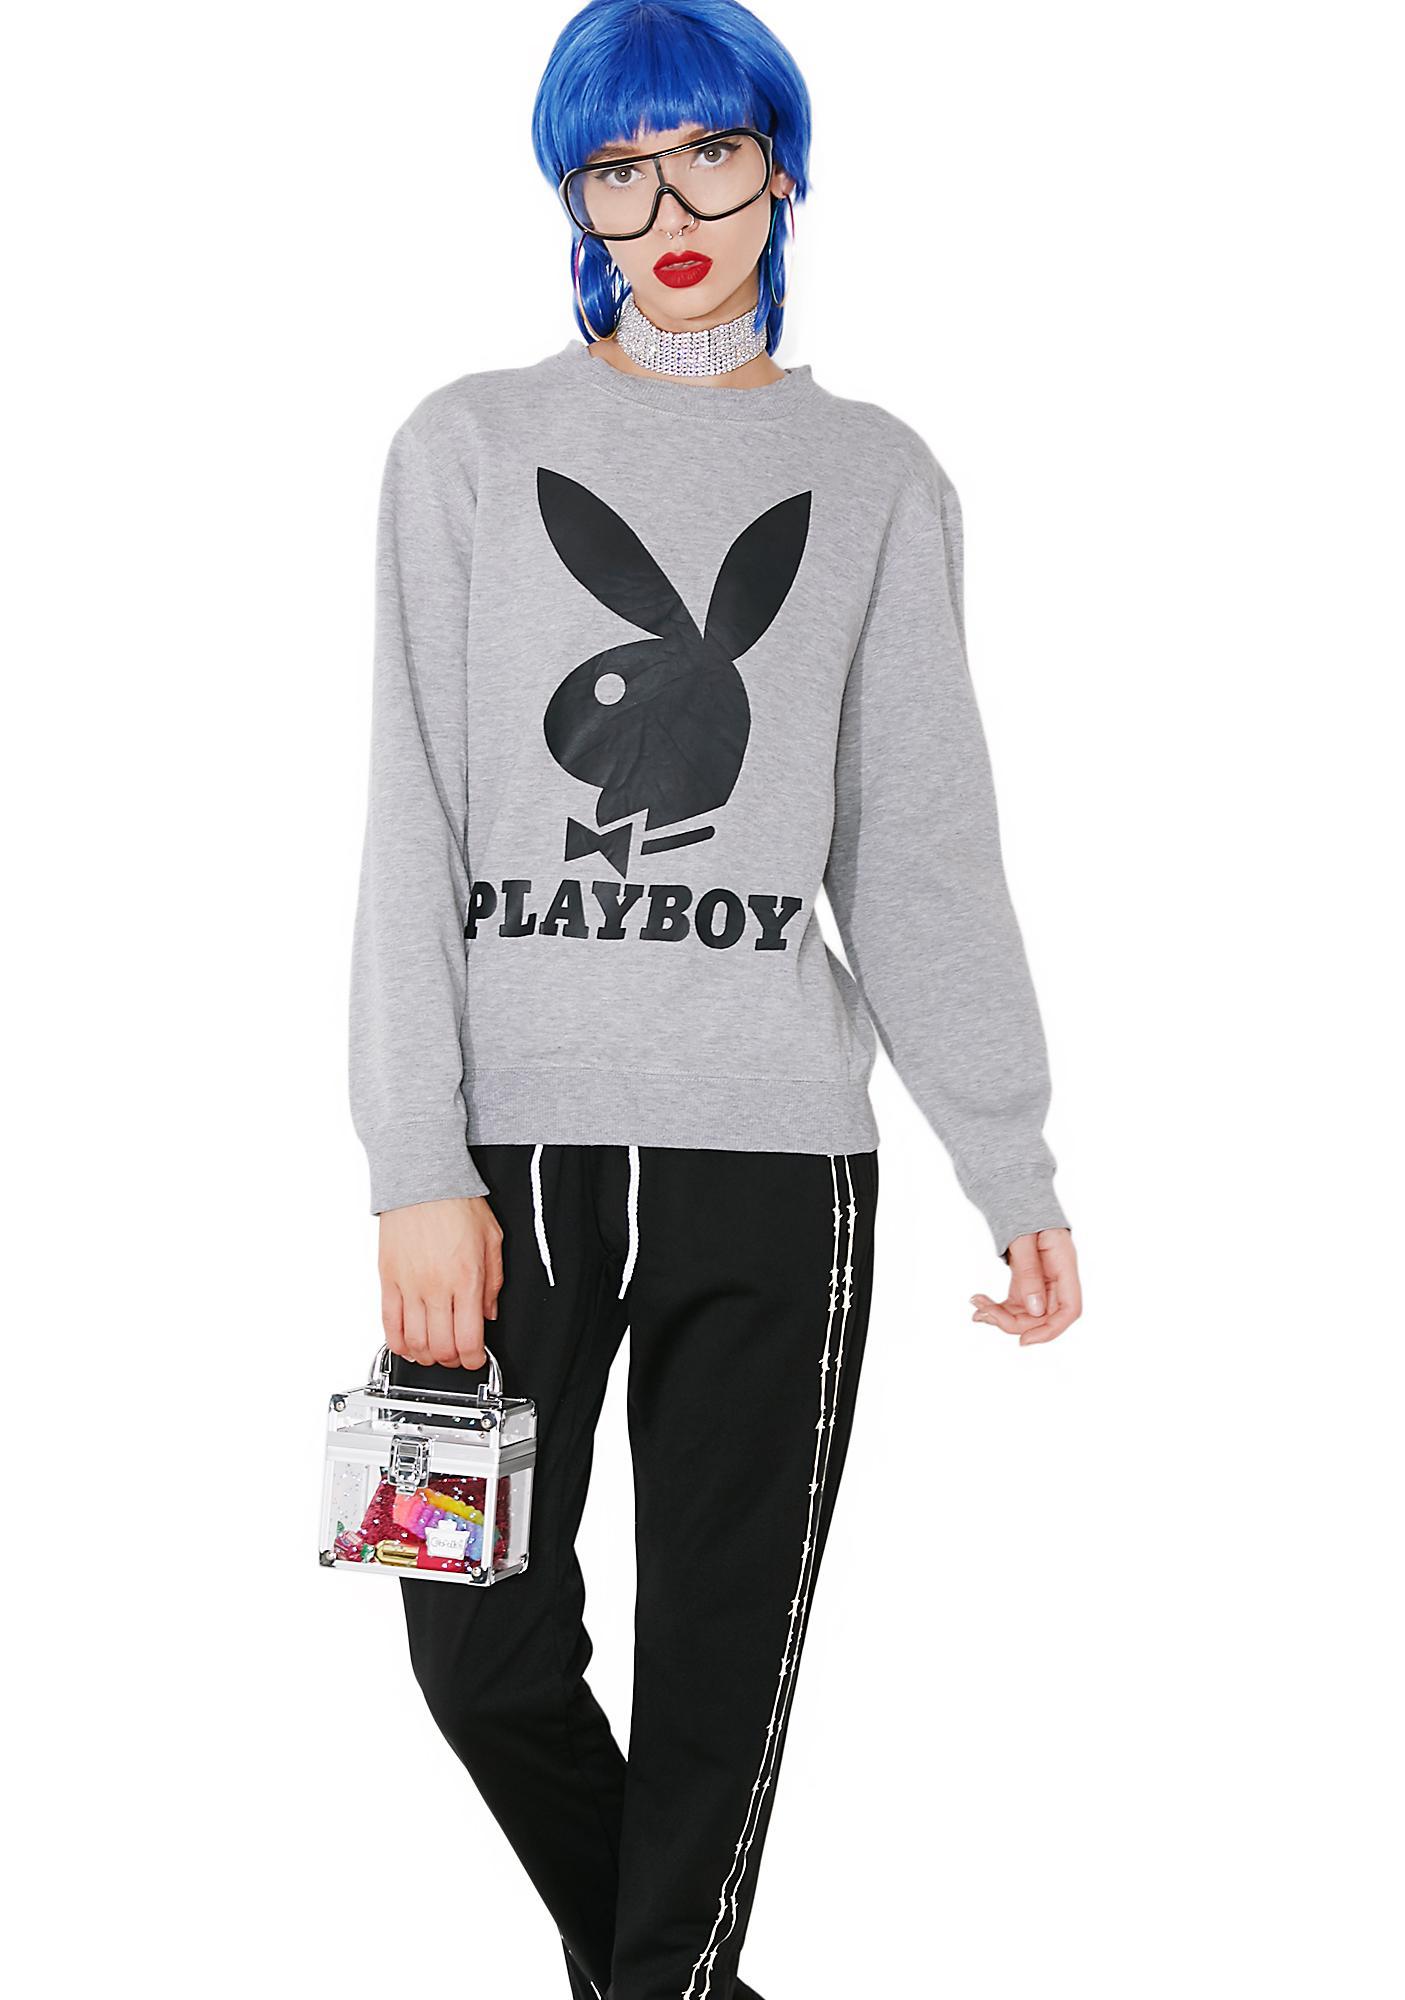 Vintage Playboy Sweatshirt